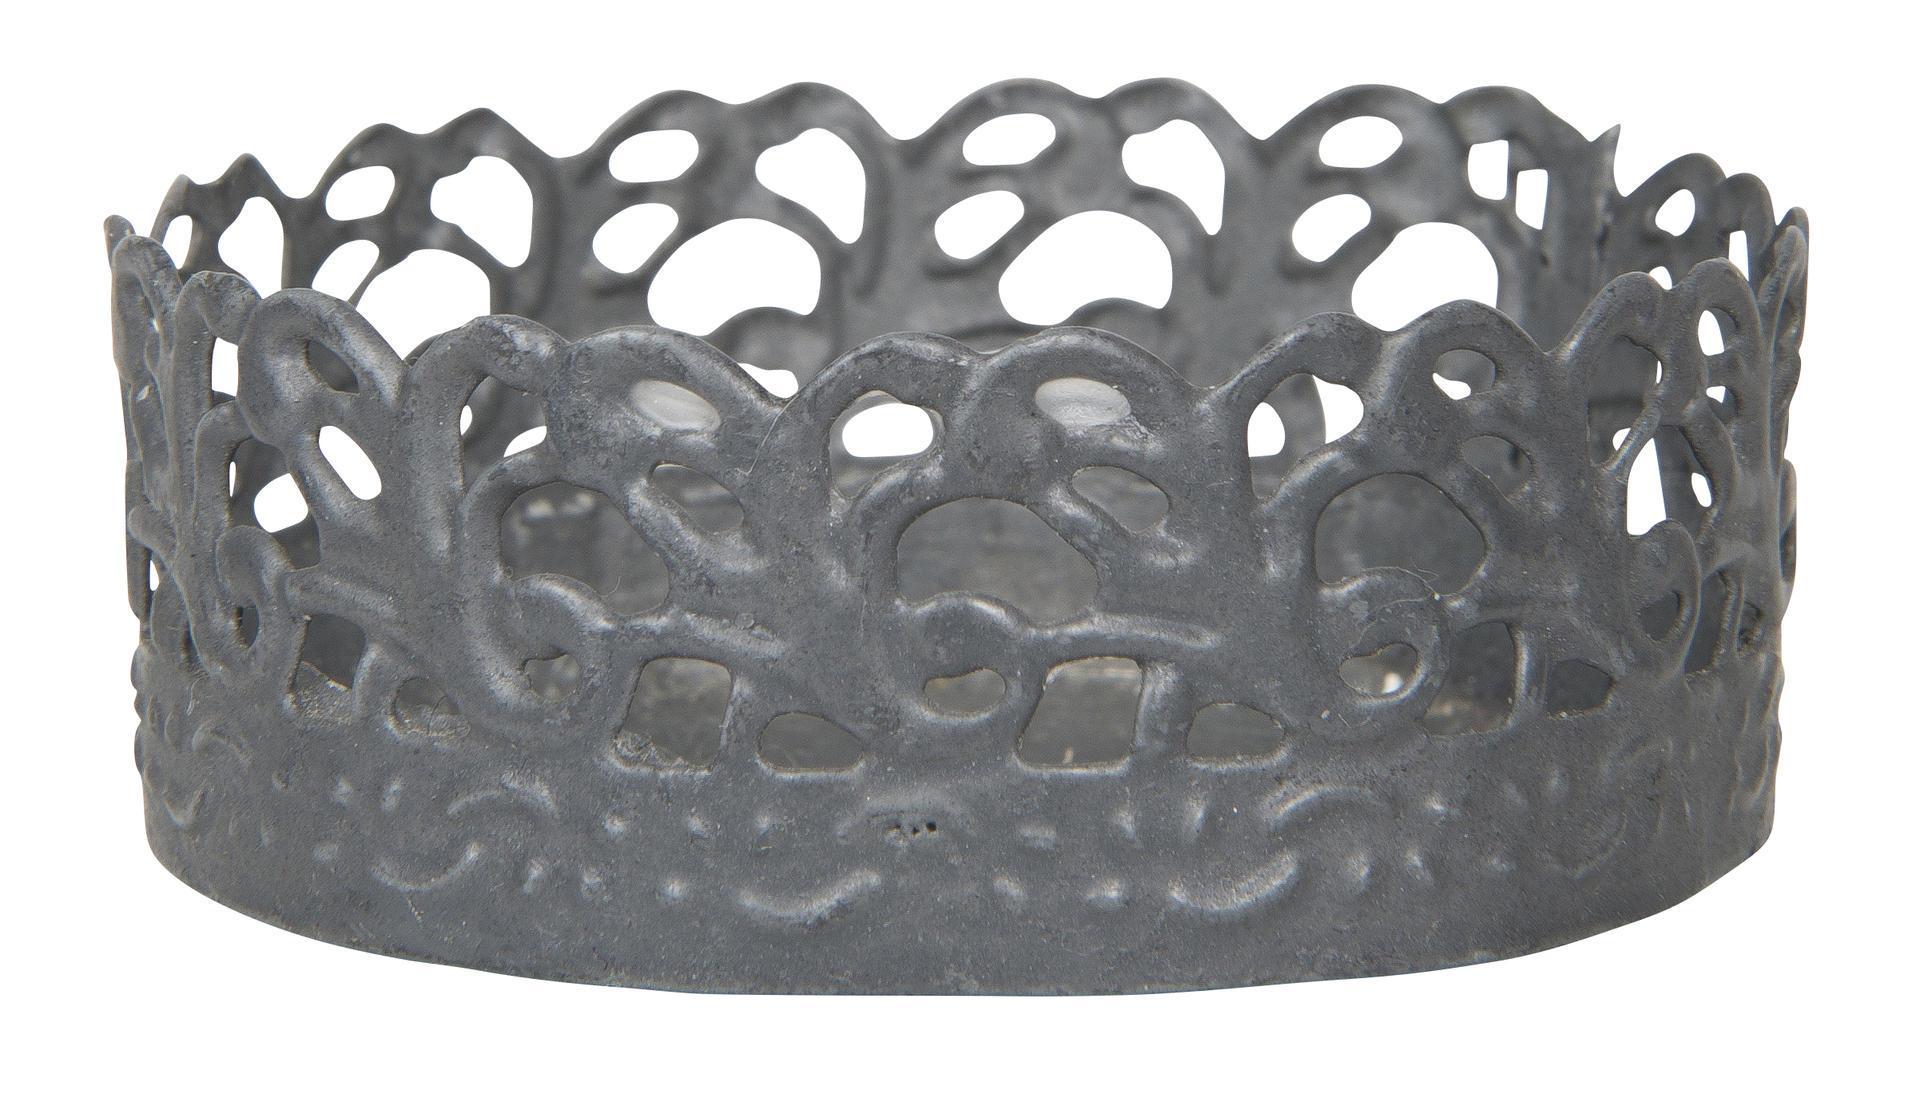 IB LAURSEN Zinkový svícen mini, šedá barva, kov